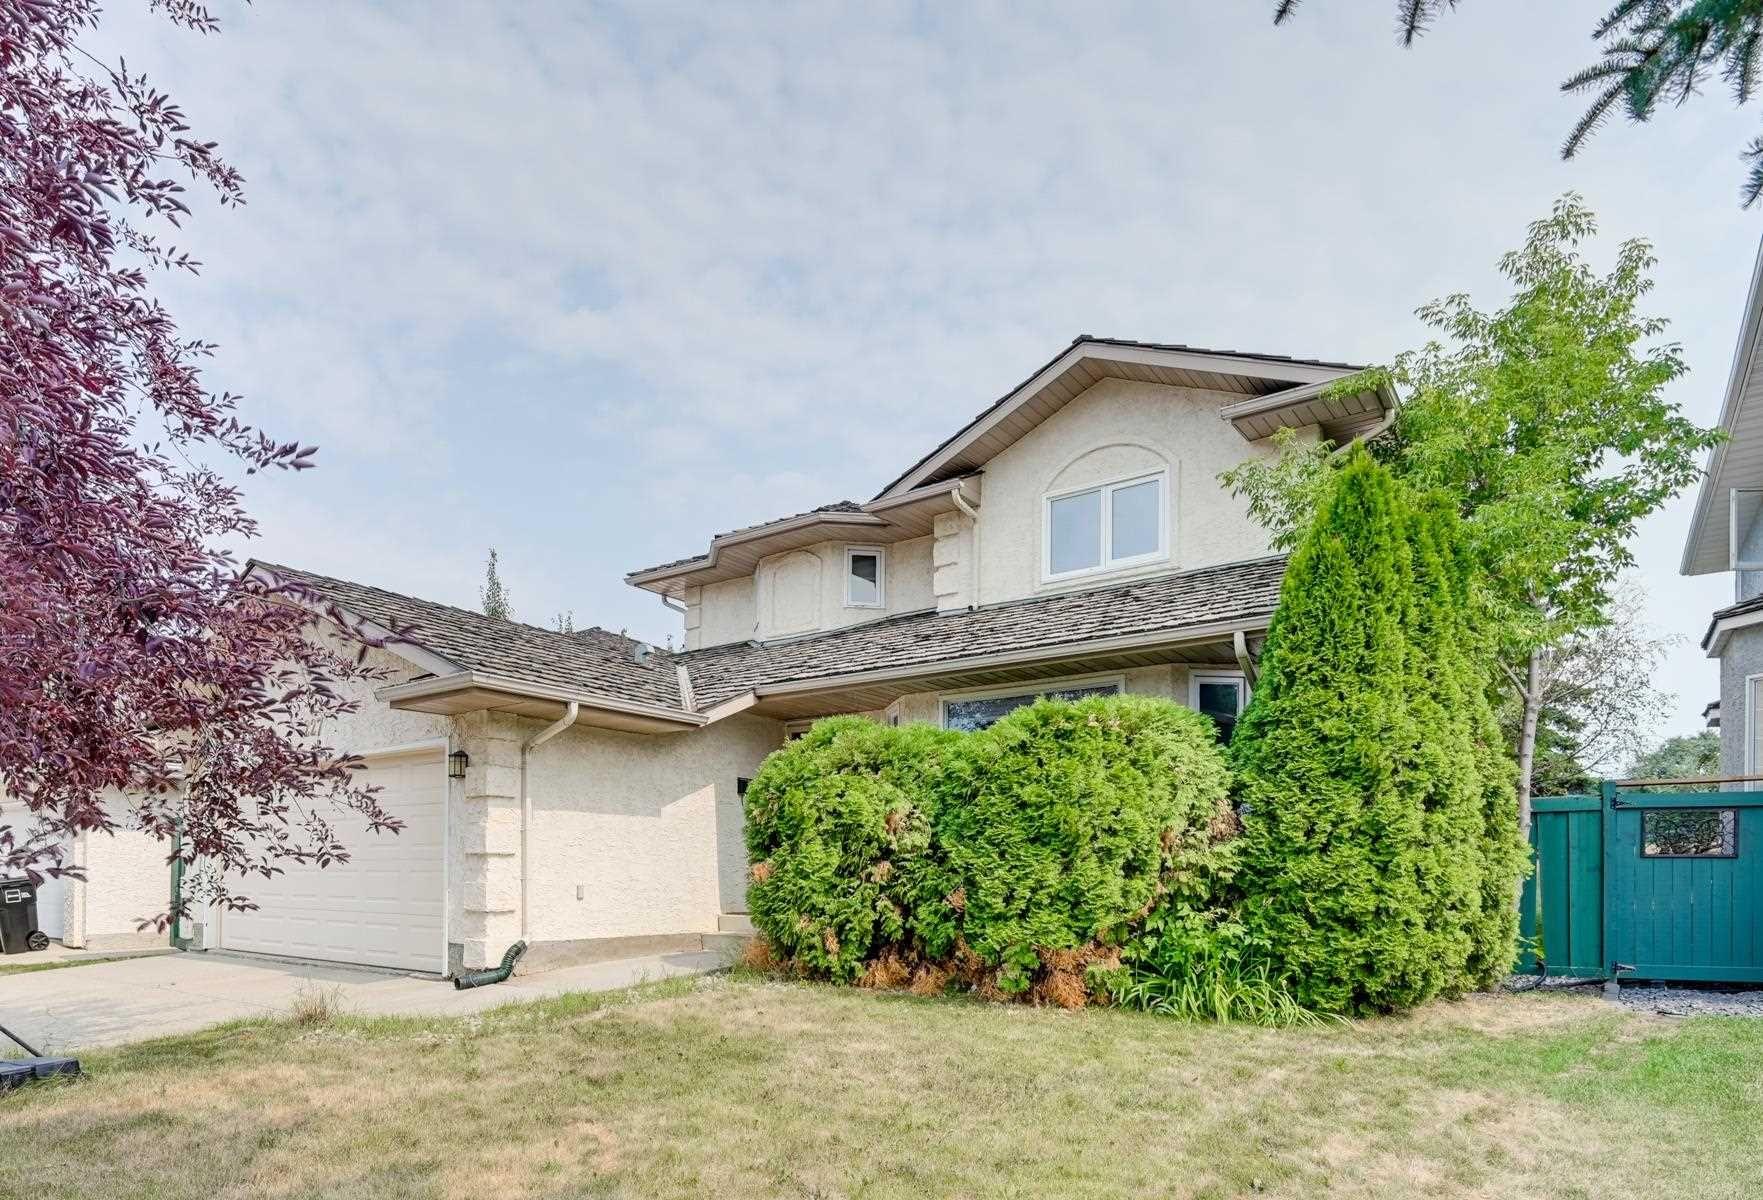 Main Photo: 227 FERGUSON Place in Edmonton: Zone 14 House for sale : MLS®# E4256988